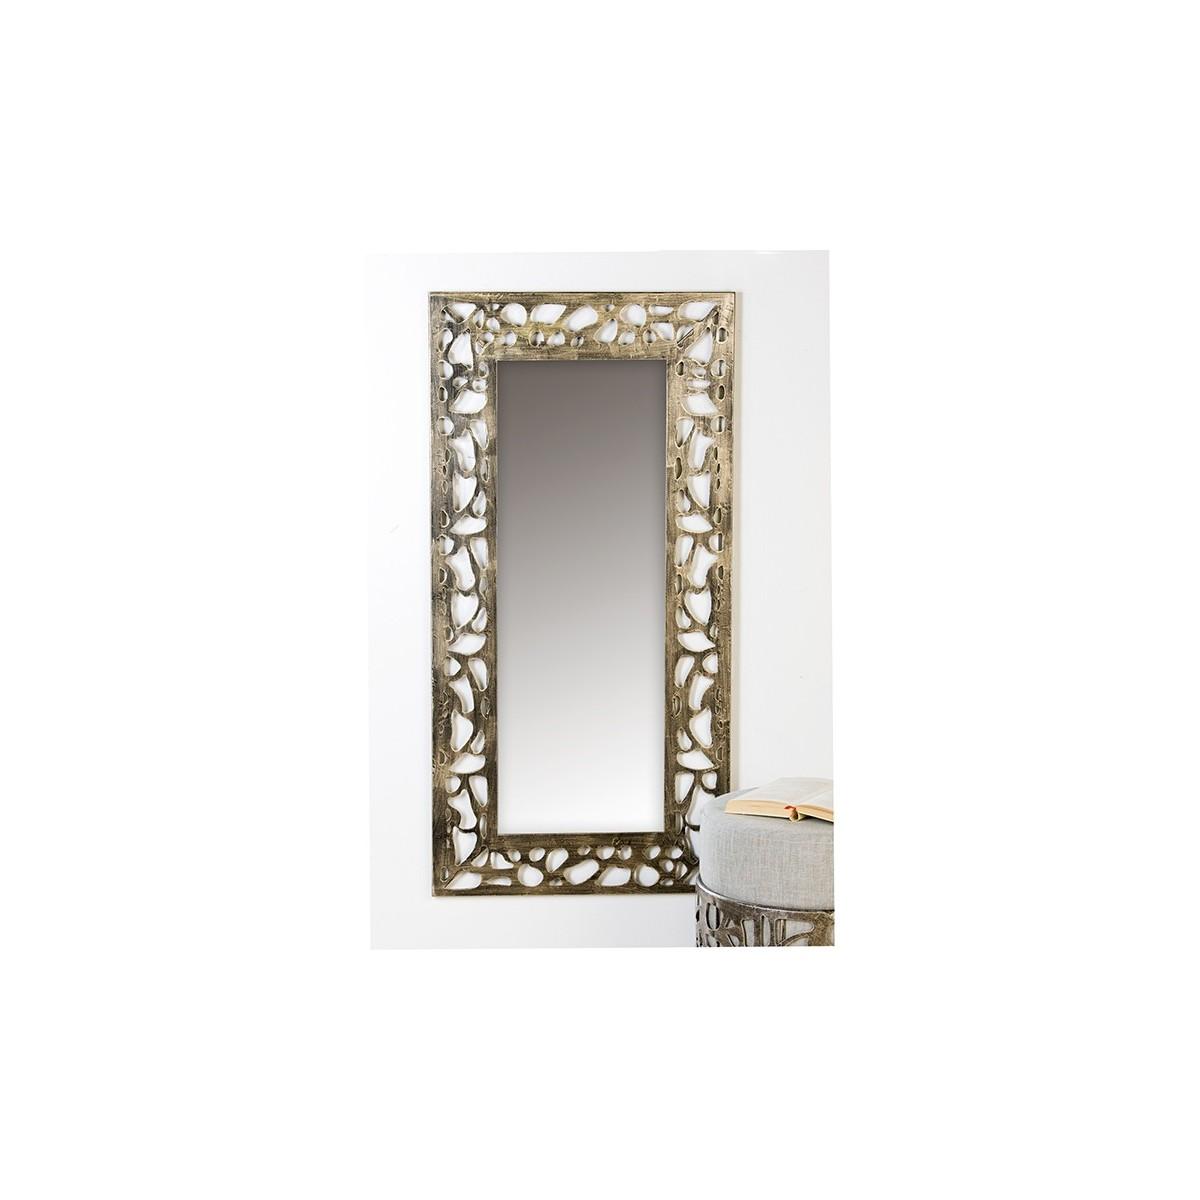 Miroir soleil en m tal ellis for Miroir miroir full movie